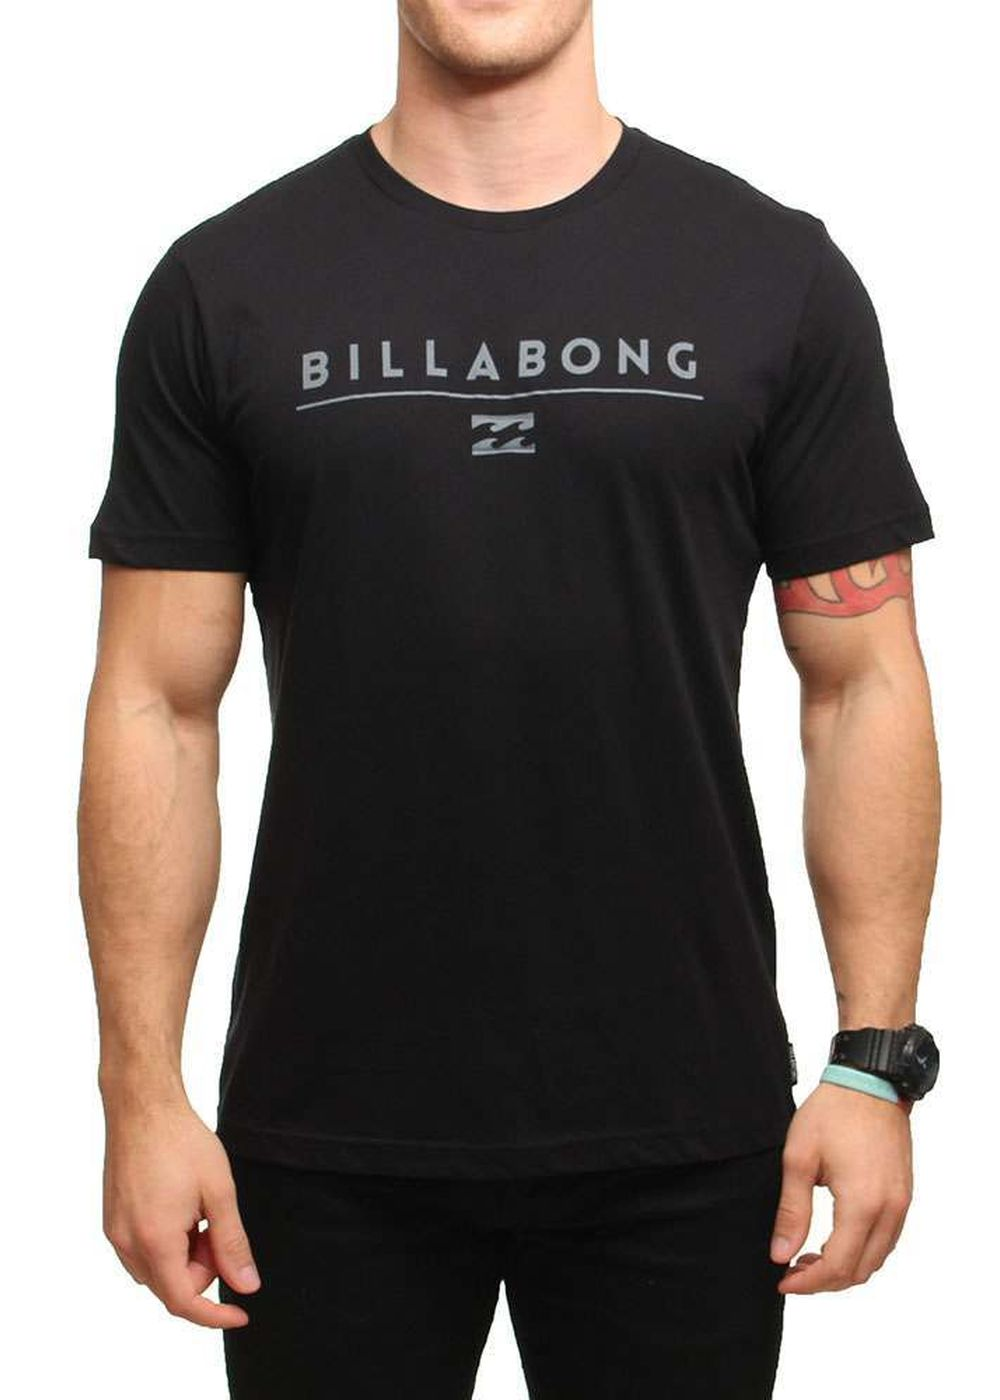 Billabong Unity Tee Black